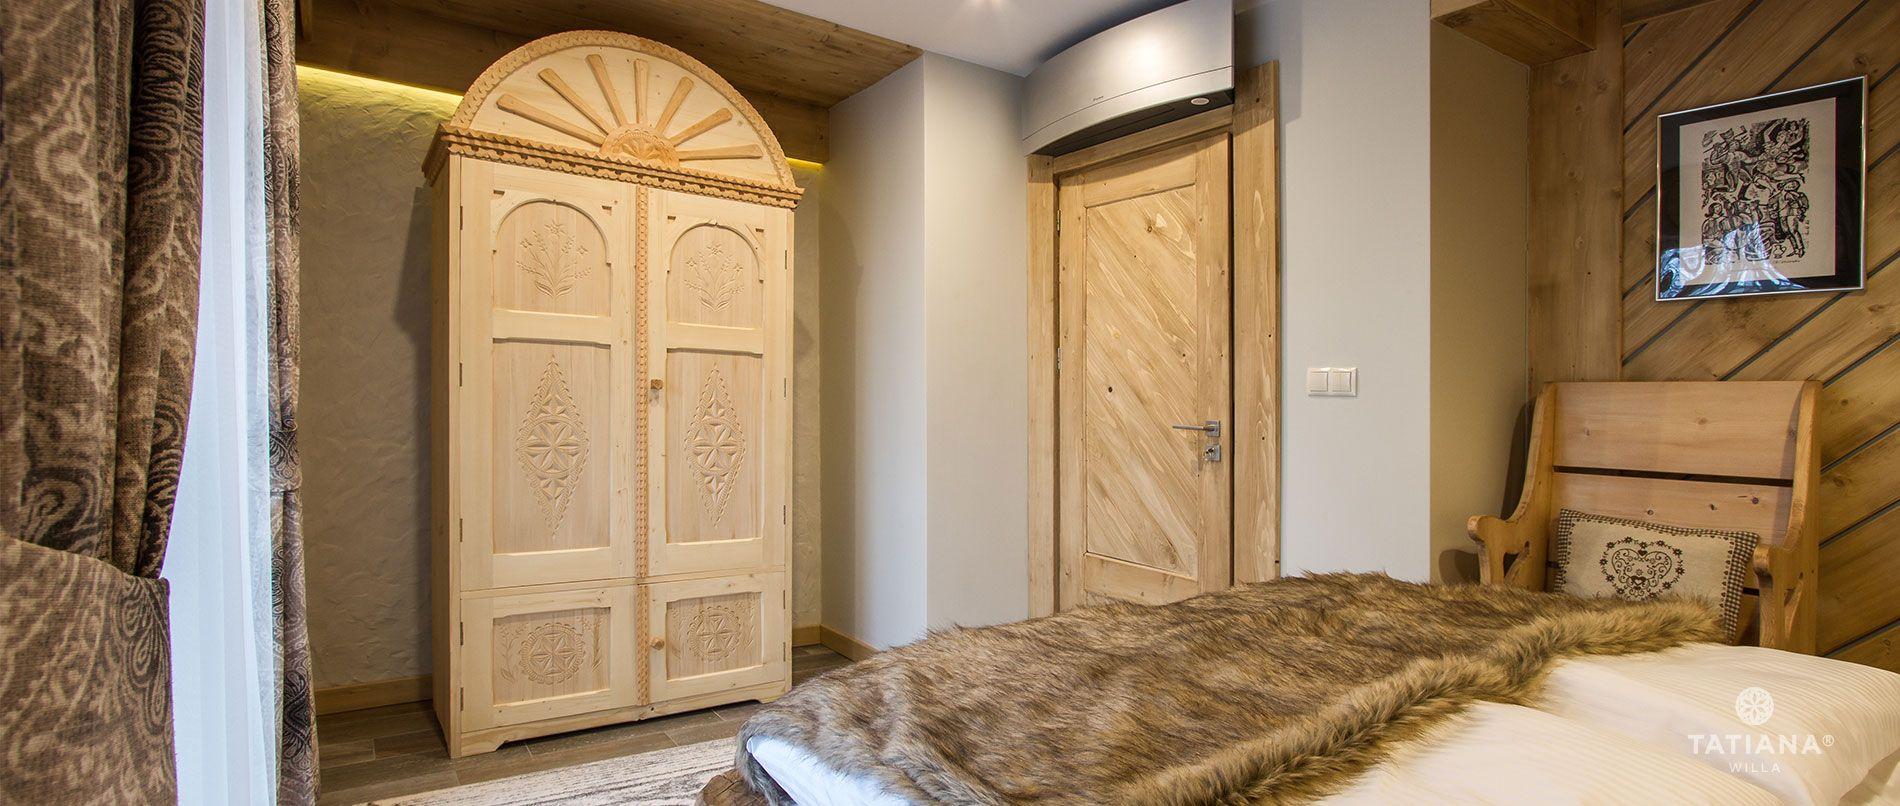 Apartament Stary Smrekowy - sypialnia